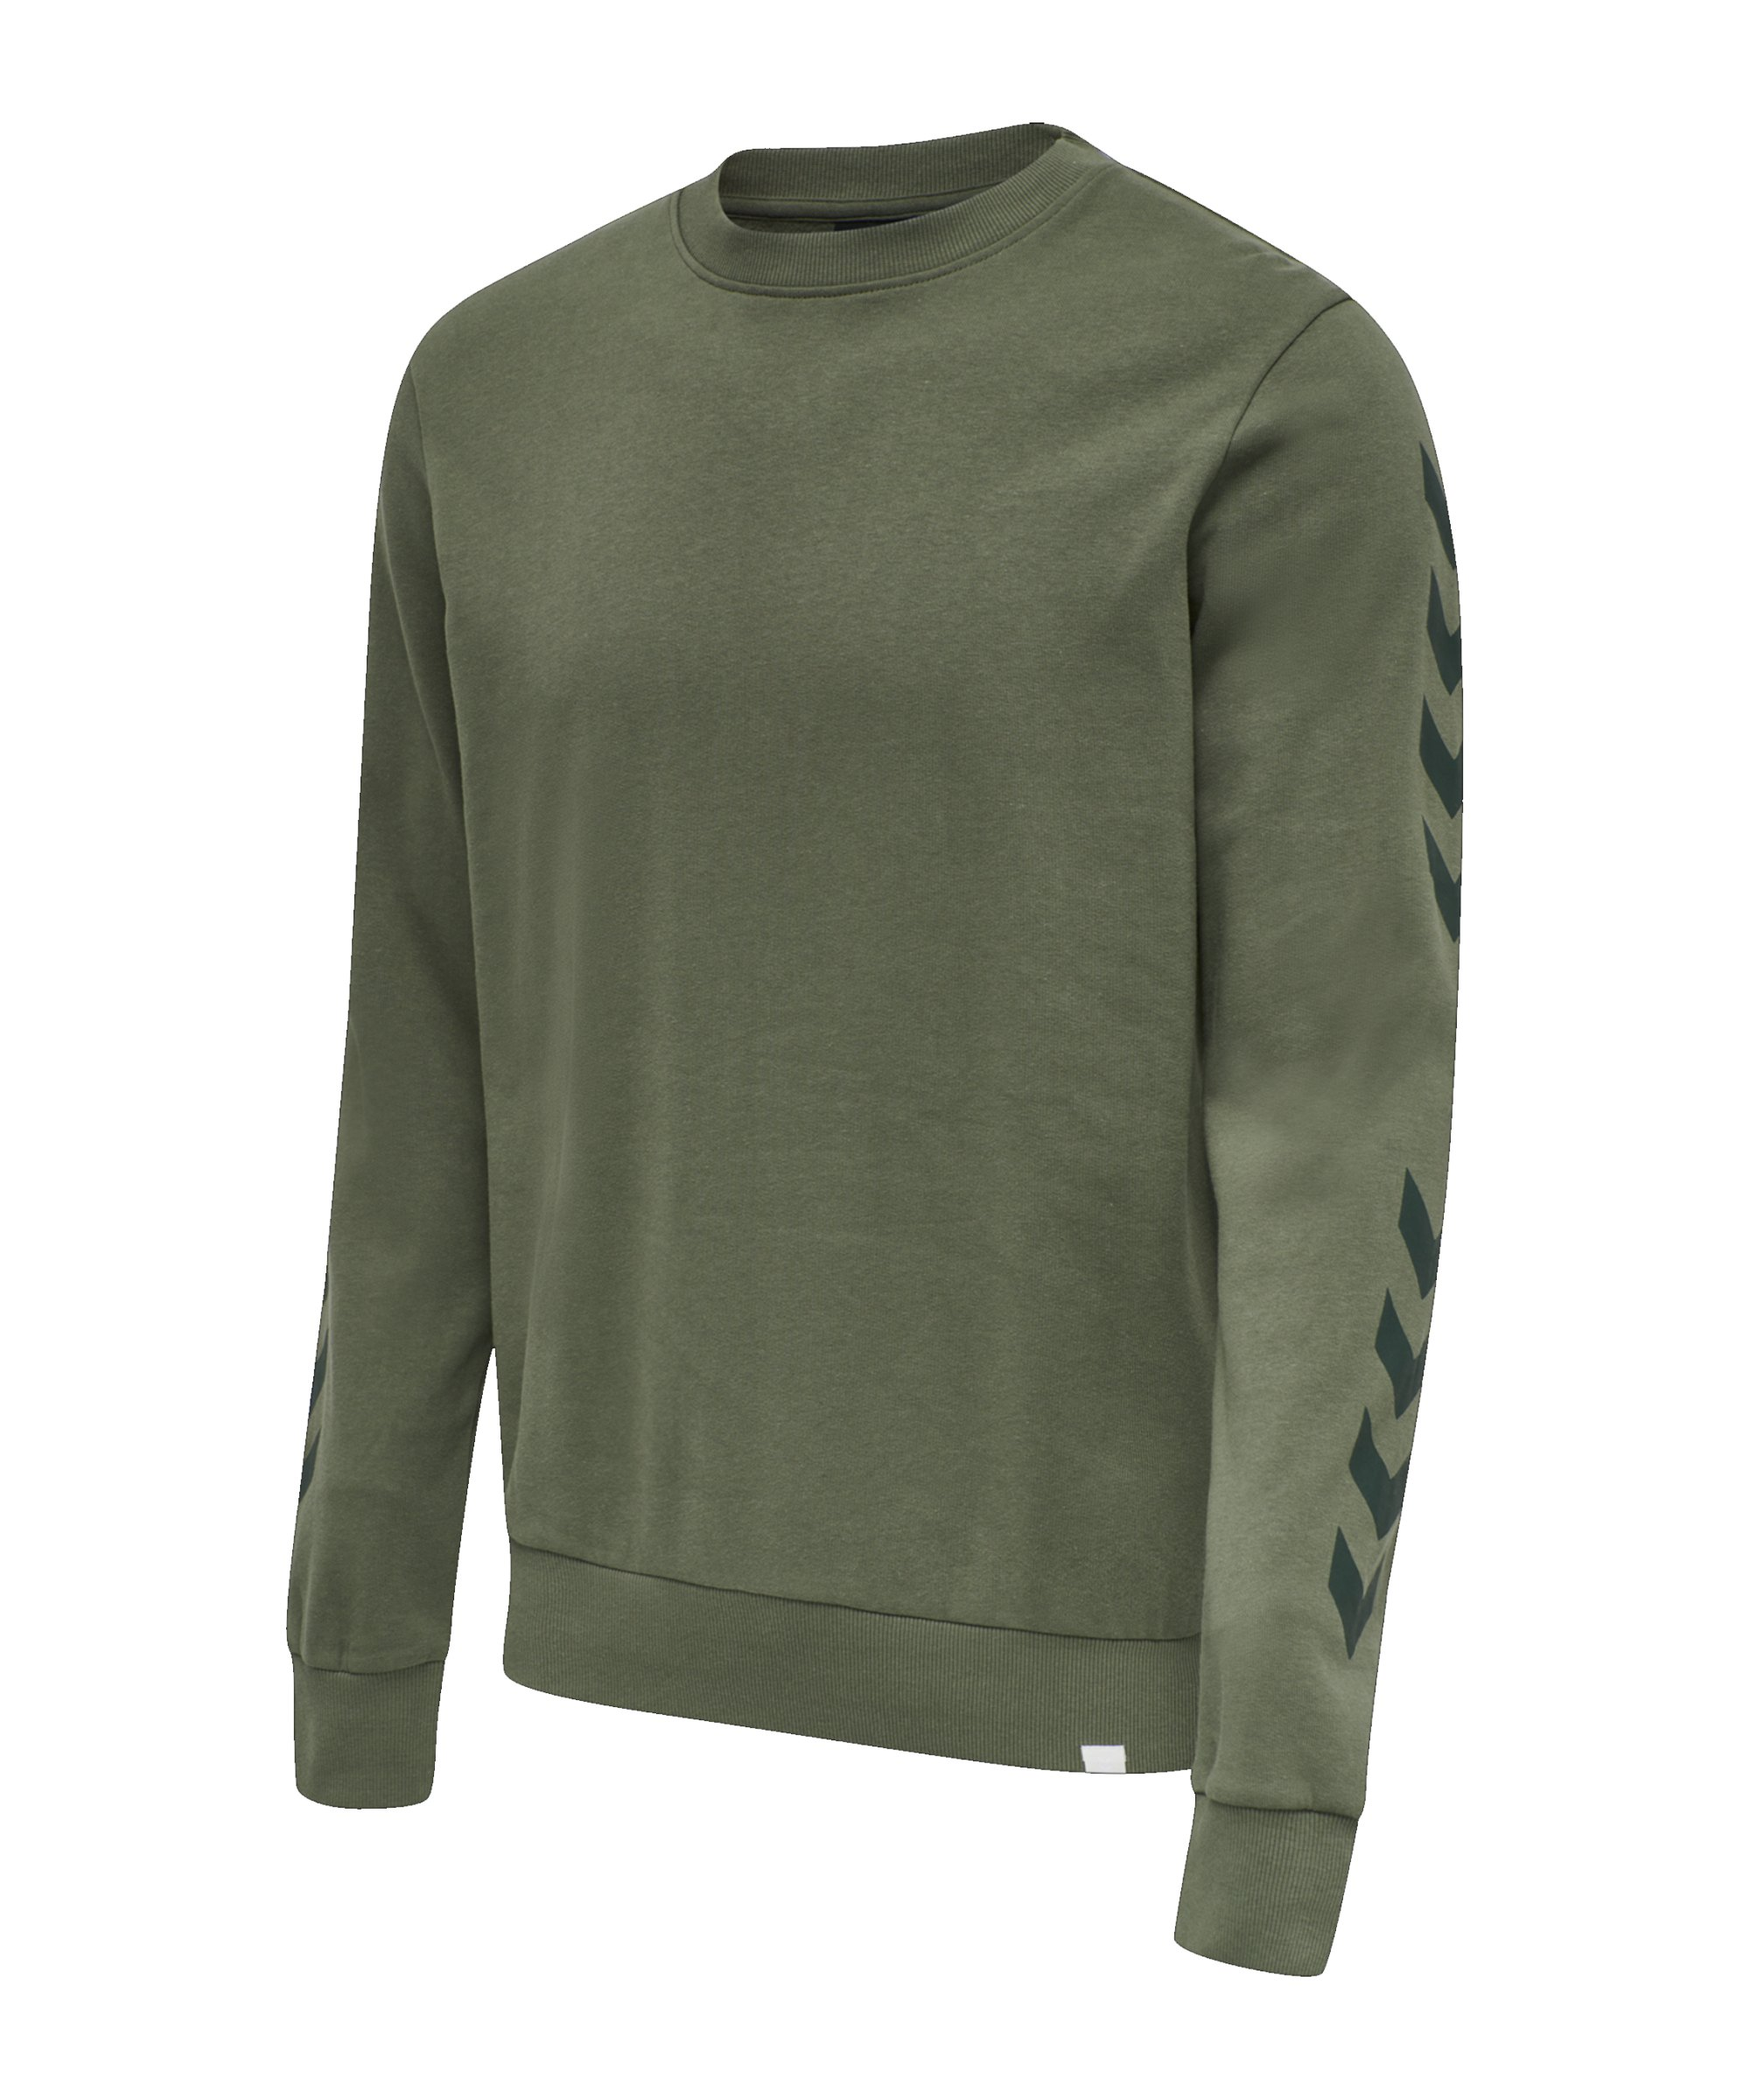 Hummel Legacy Chevron Sweatshirt Grün F6012 - khaki